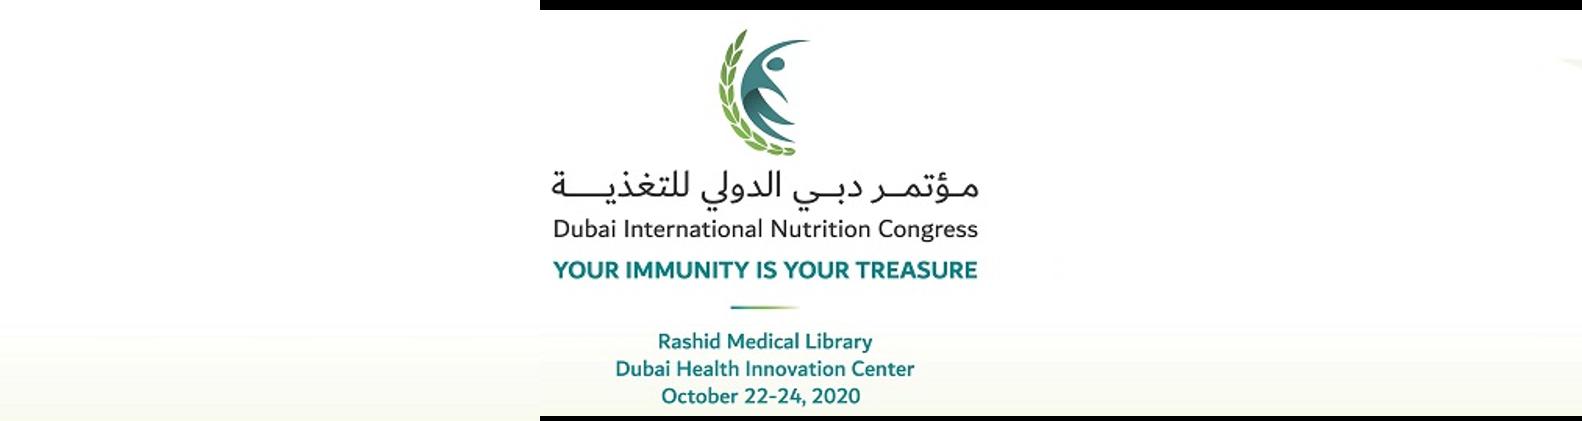 Dubai International Nutrition Congress 2020